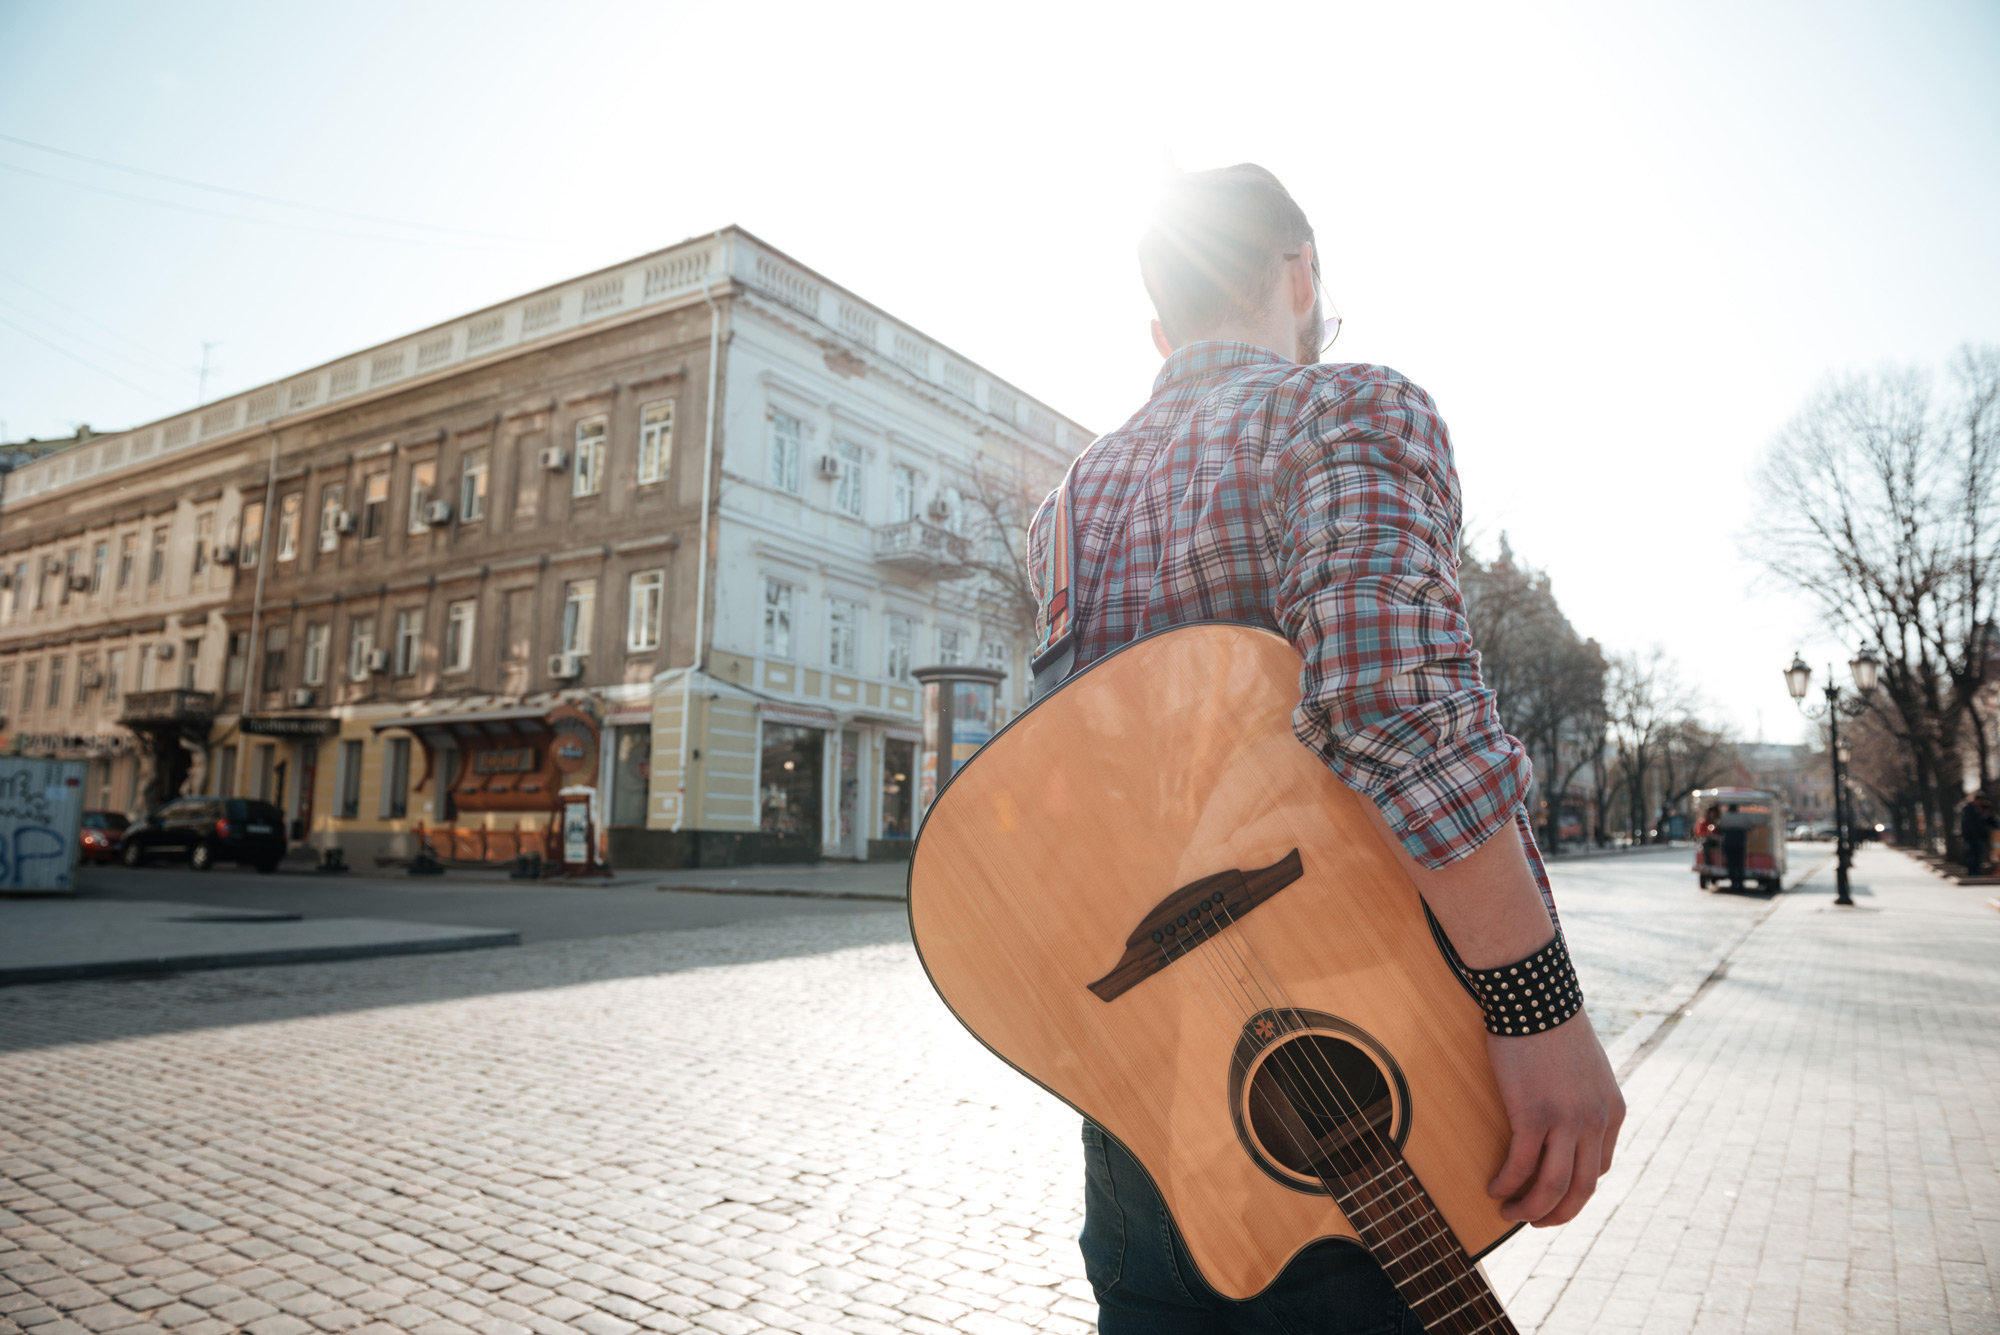 man-walking-with-guitar-outdoors-P66N2F7.jpg